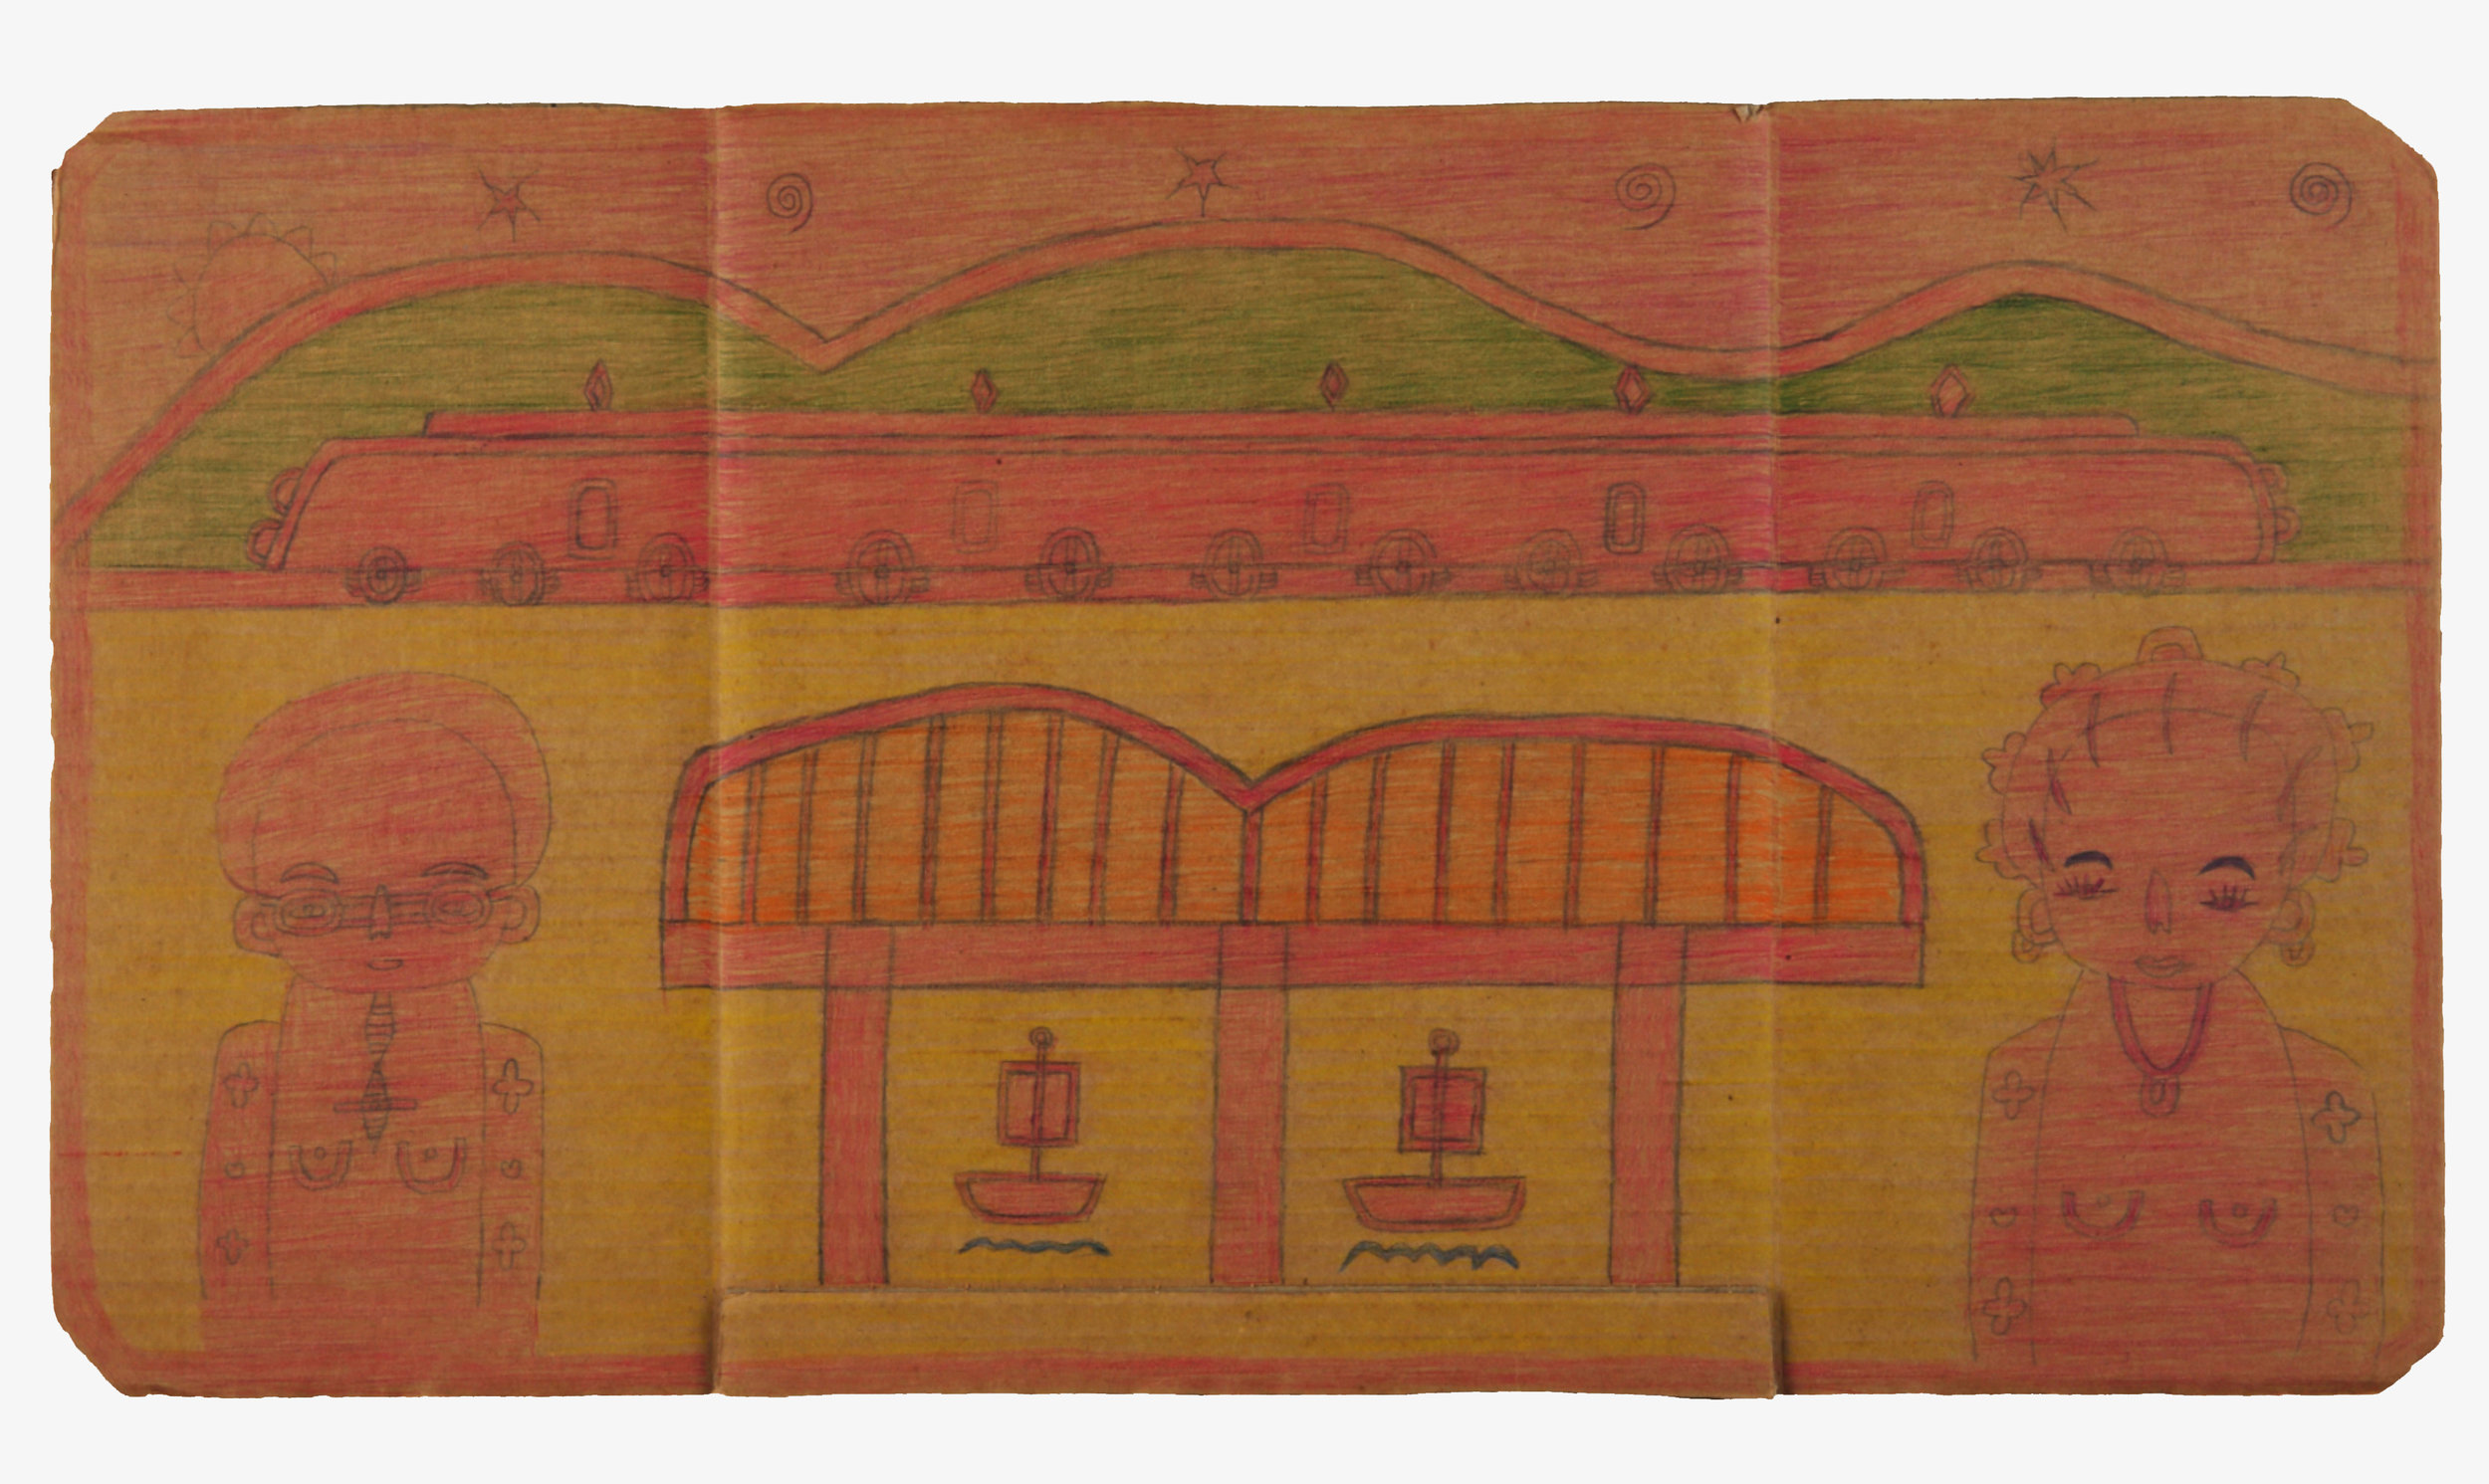 Untitled (15) Pencil crayon on cardboard 63x34cm